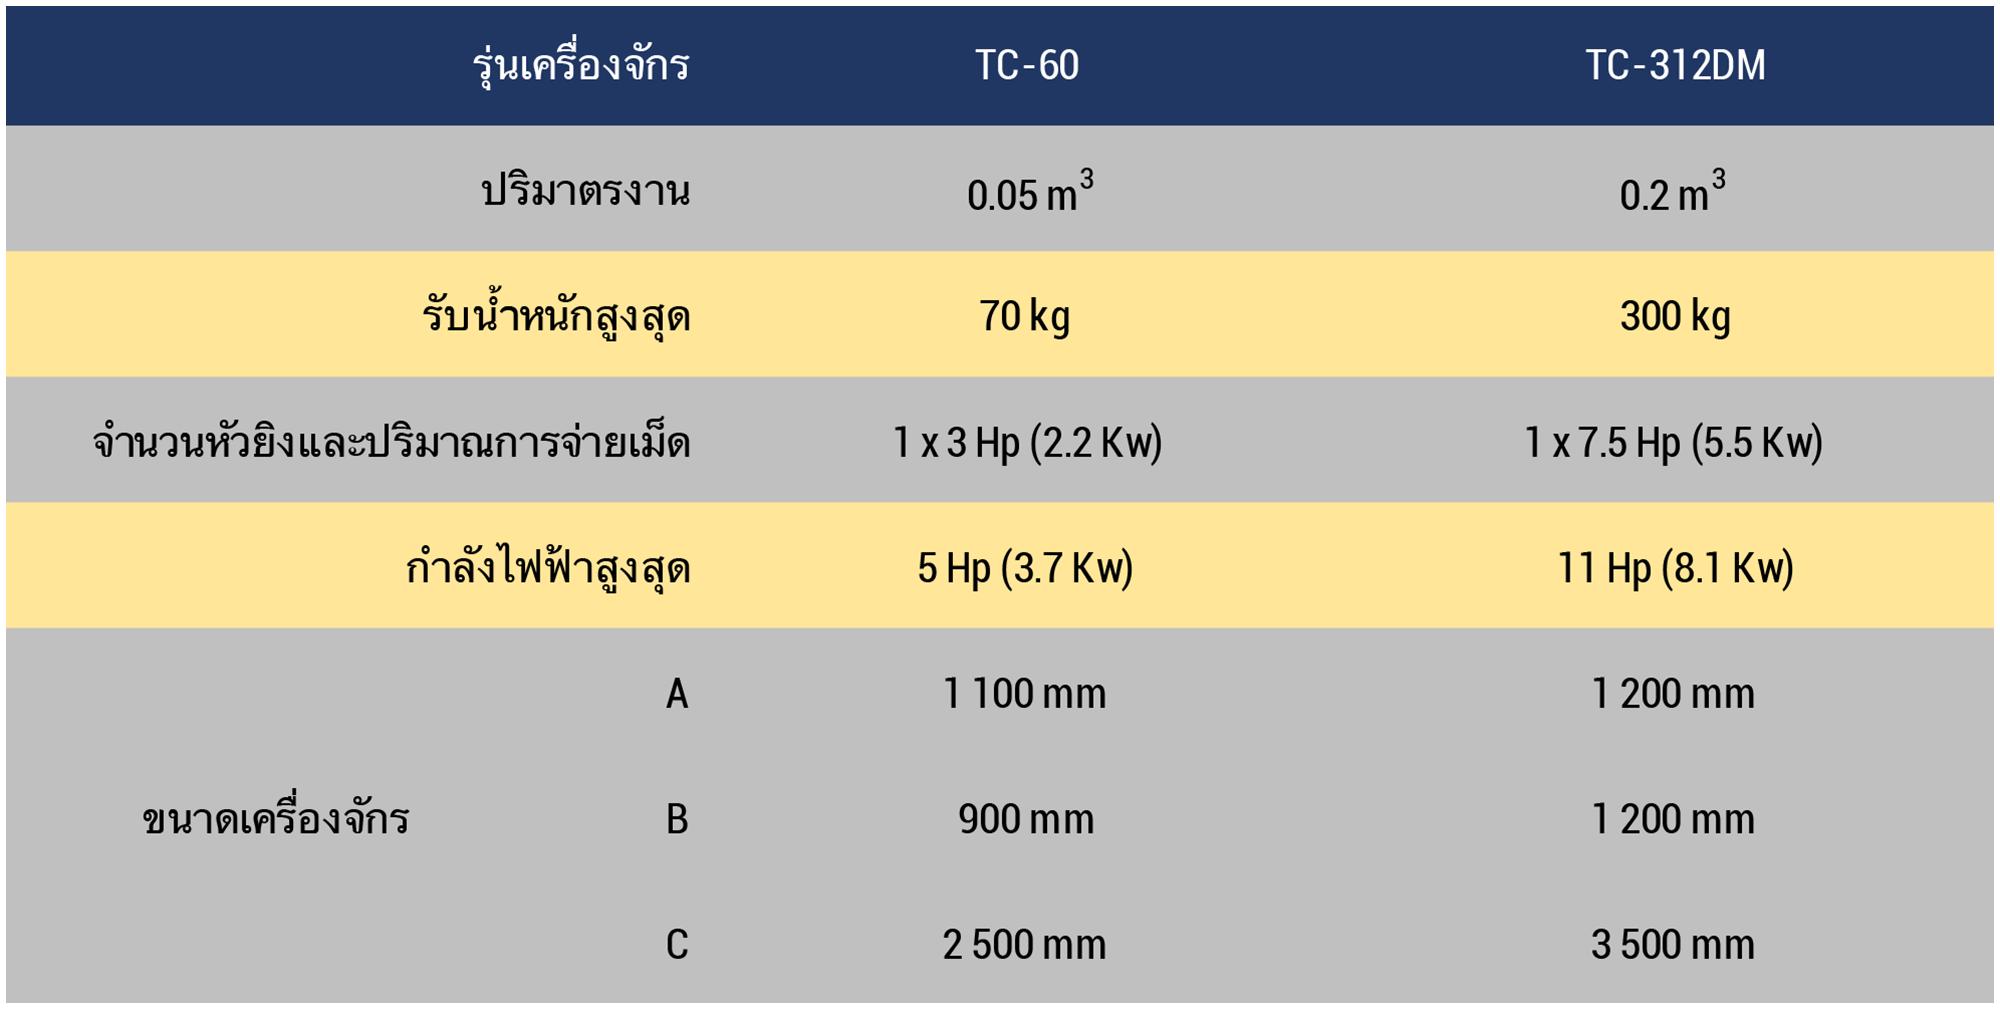 Datasheet Small Tumblast Thai